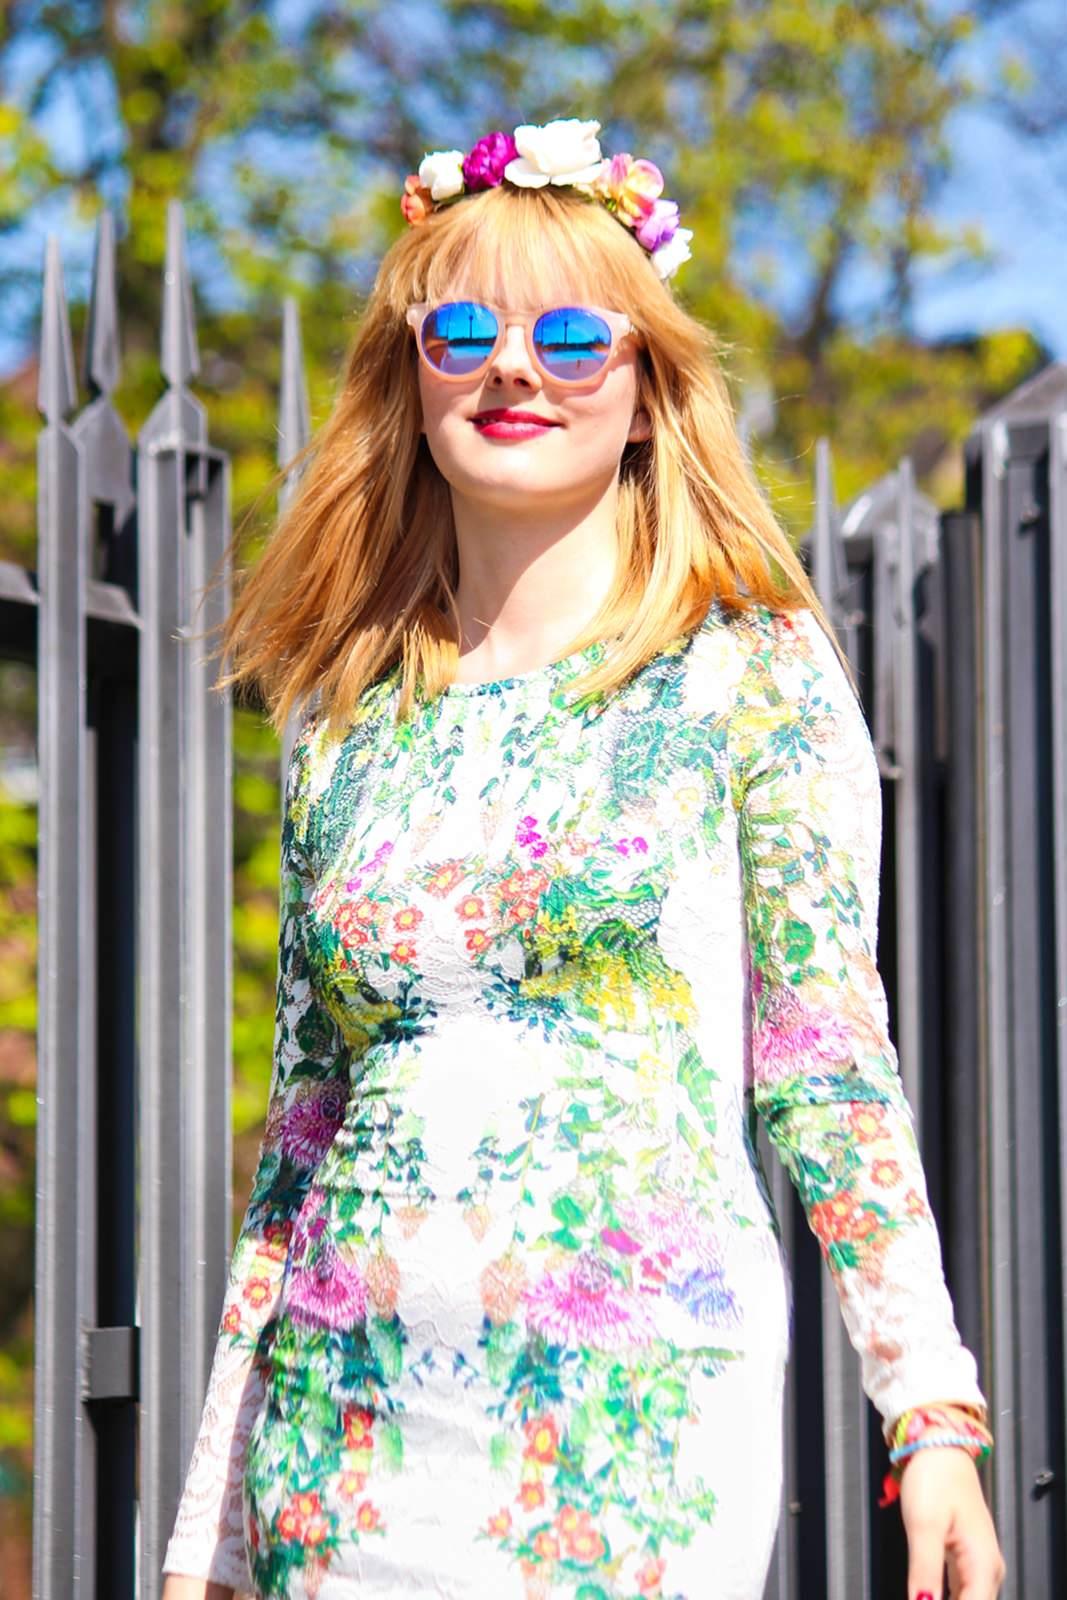 Des Belles Choses_Fashionblog Cologne_Forever 21 Flower Dress 5